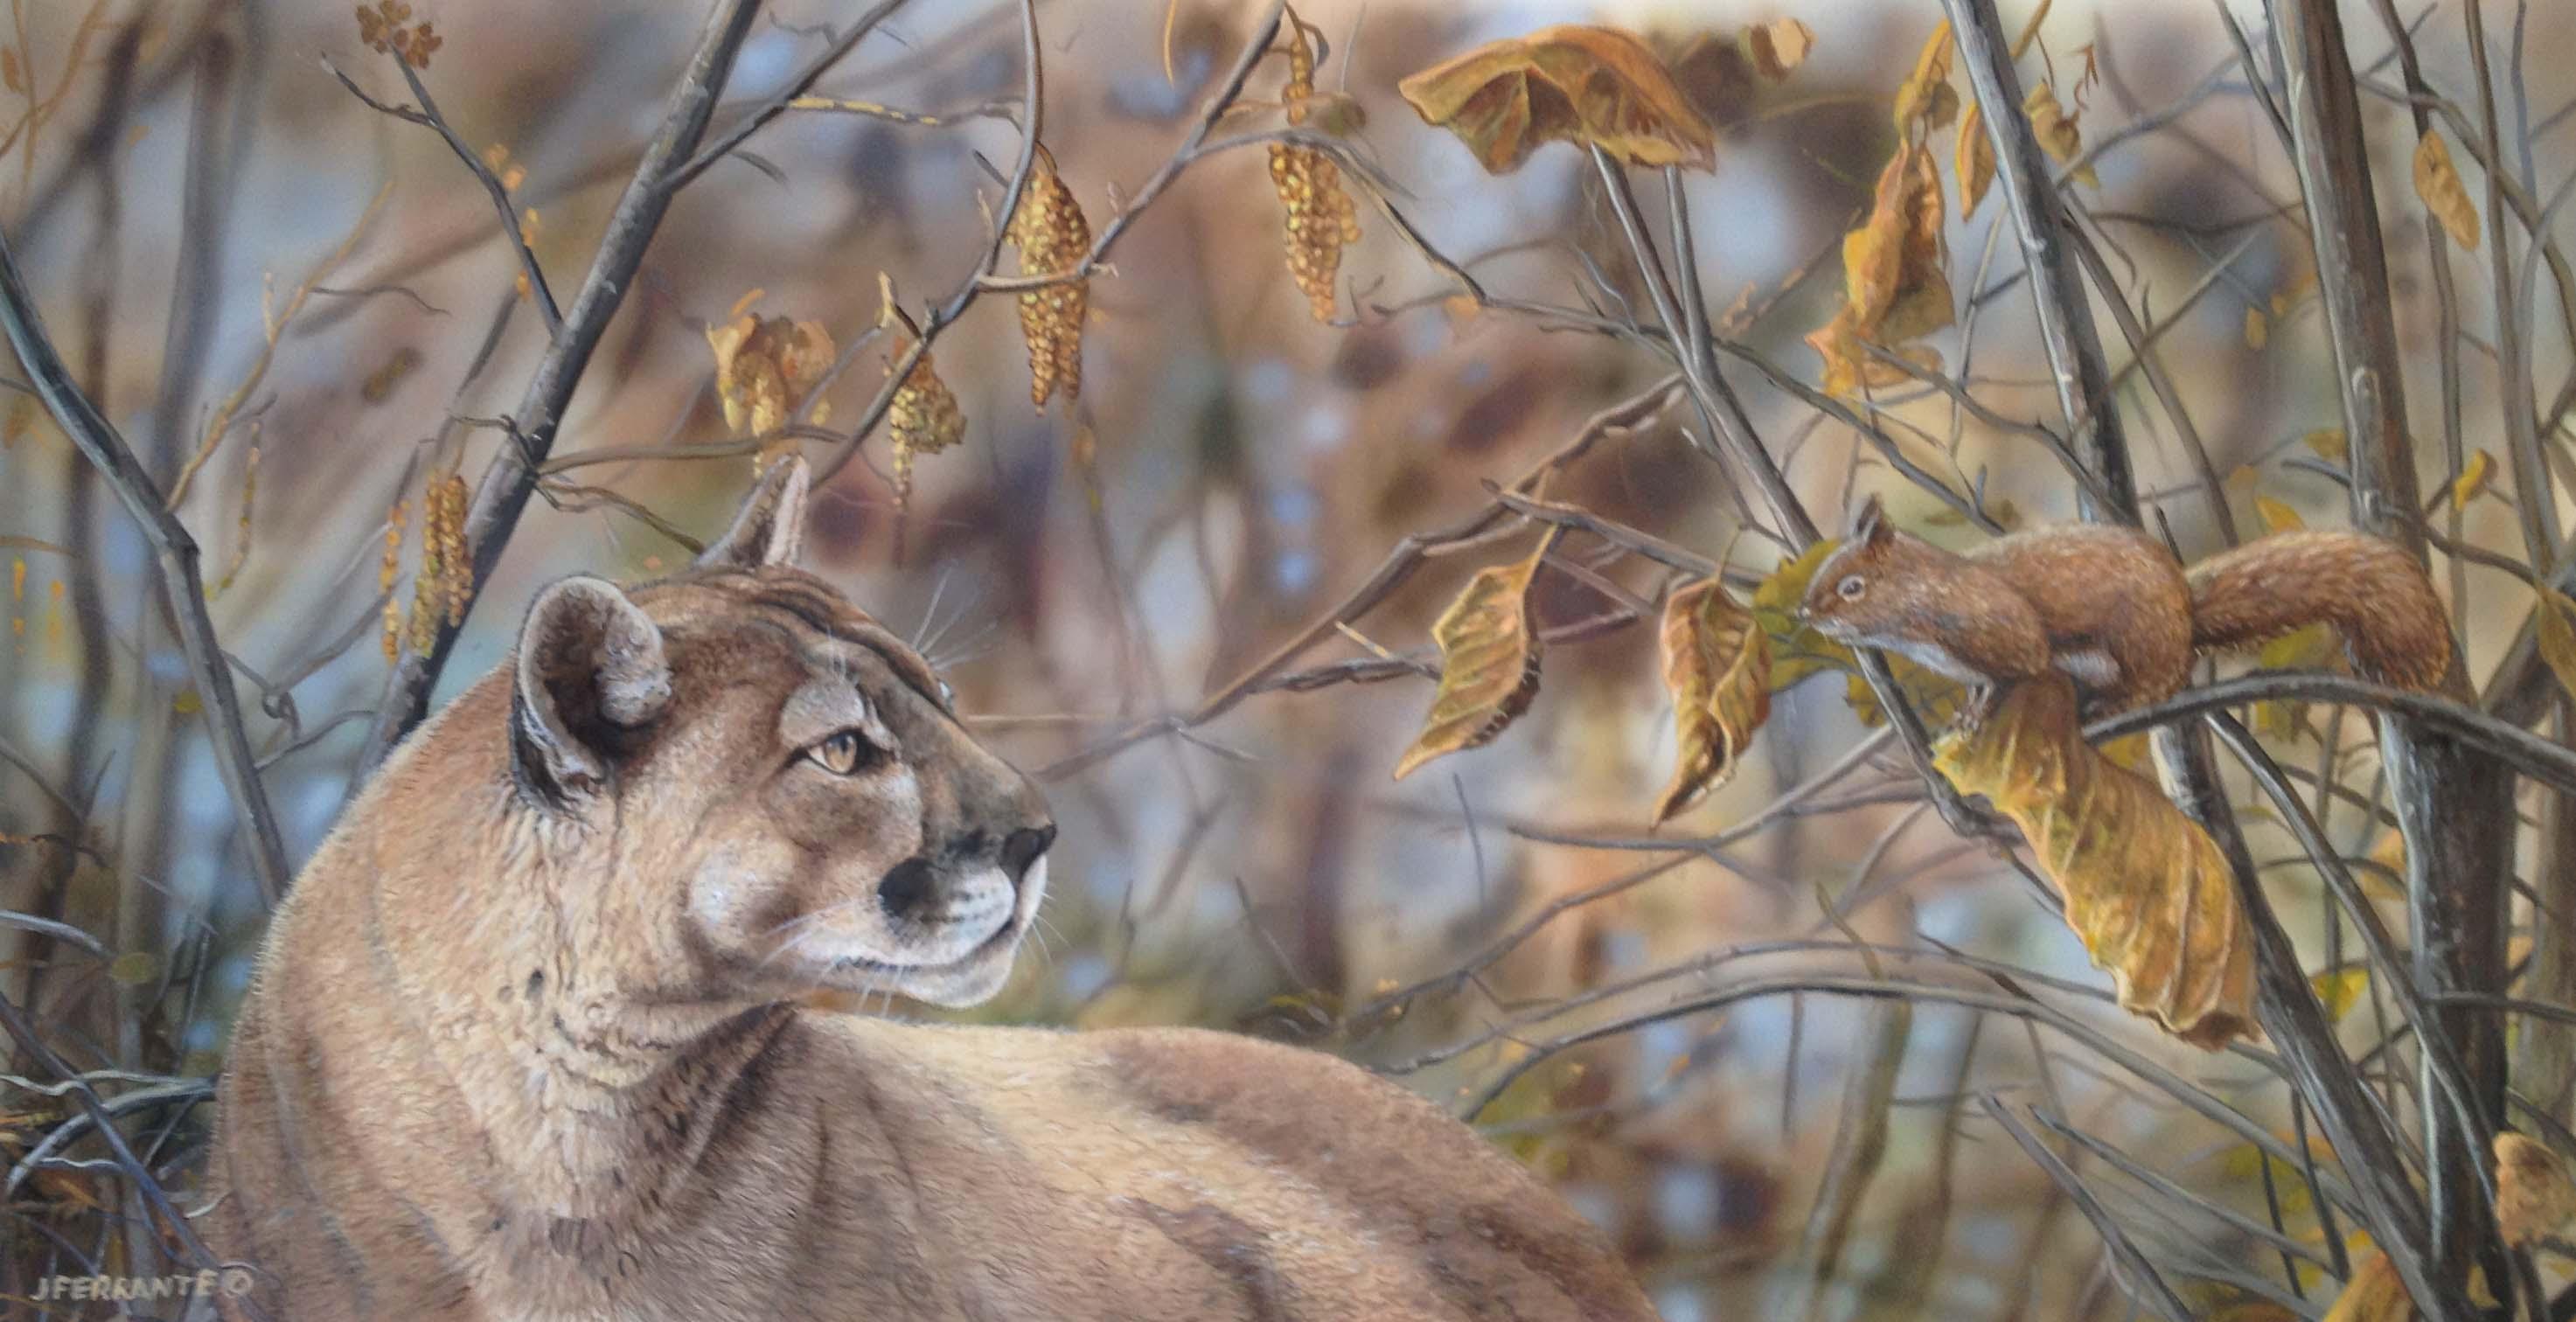 Cougar - the intruder